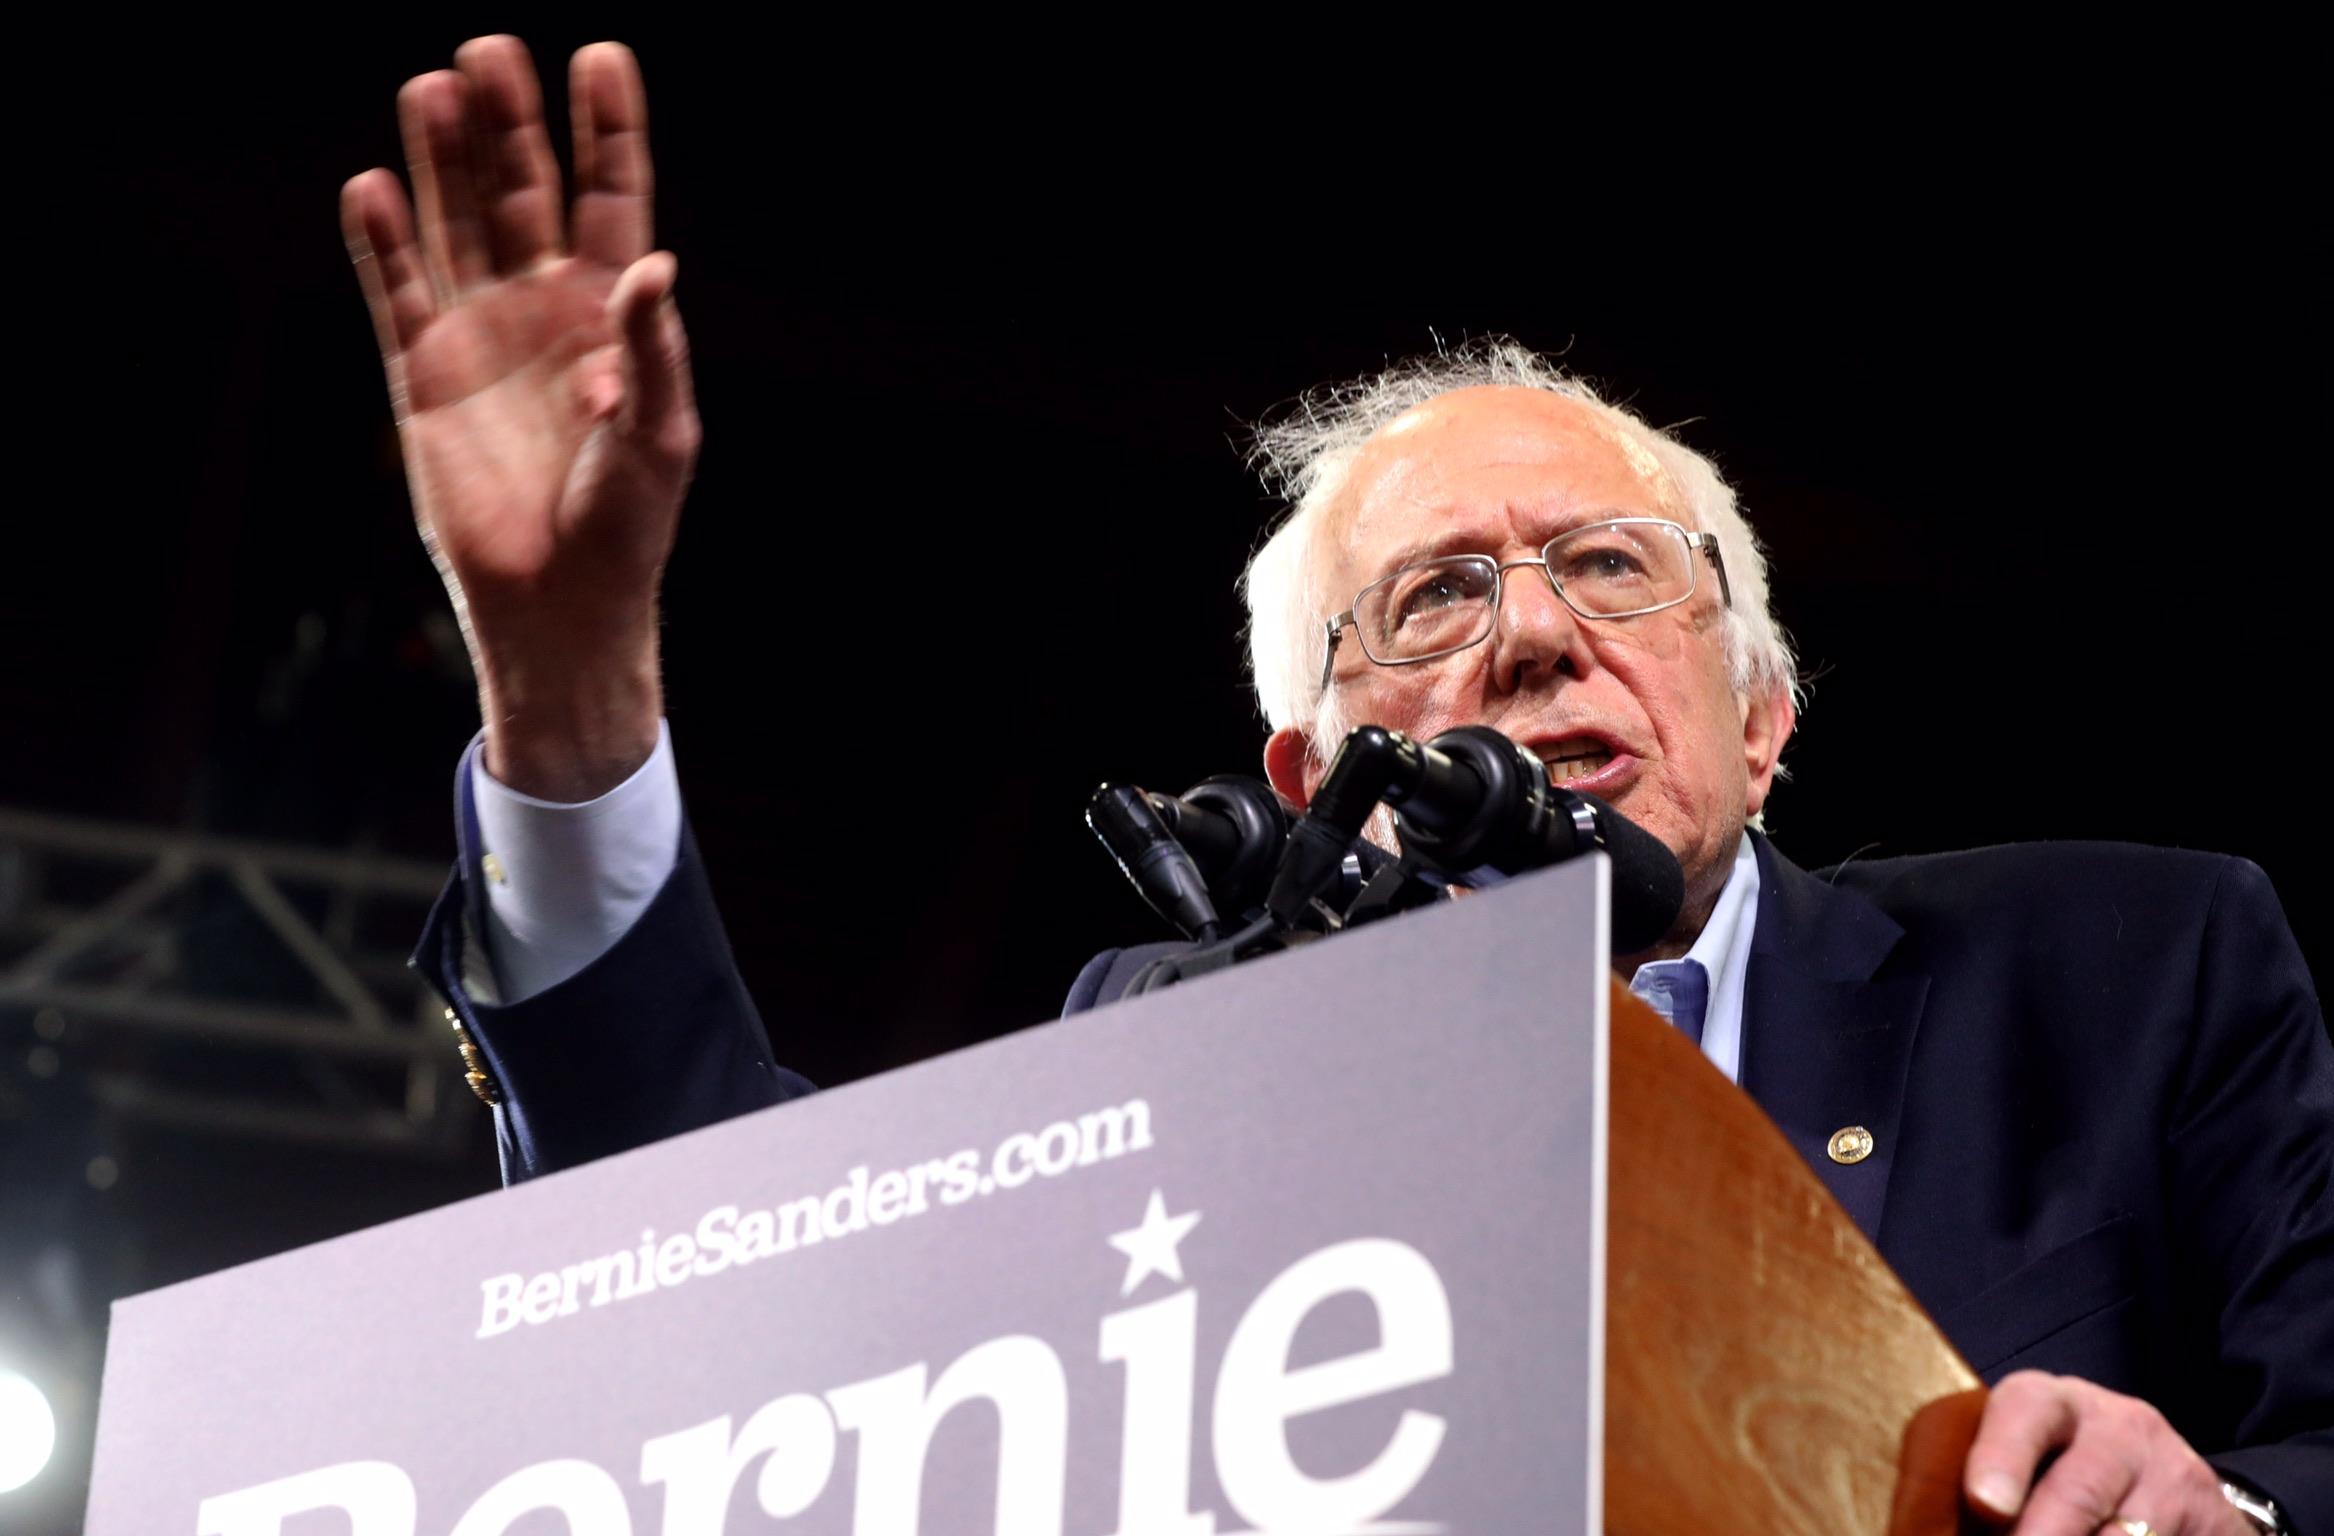 Democratic U.S. presidential candidate Senator Bernie Sanders speaks at his Super Tuesday rally in Essex Junction, Vermont, U.S., March 3, 2020. REUTERS/Jonathan Ernst